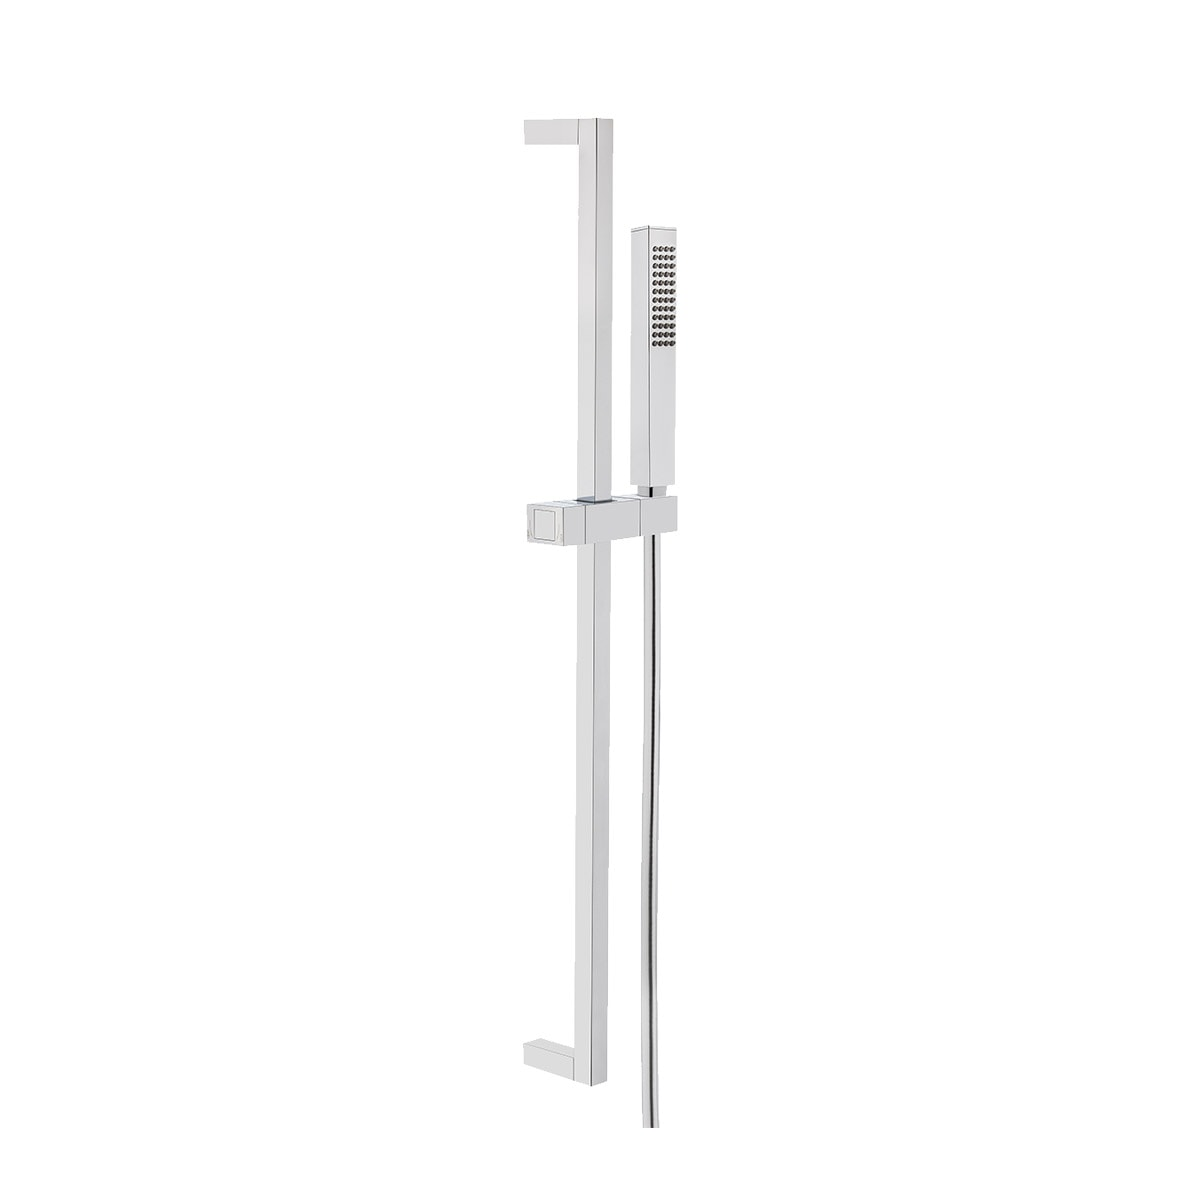 Sticx 1F Shower Set